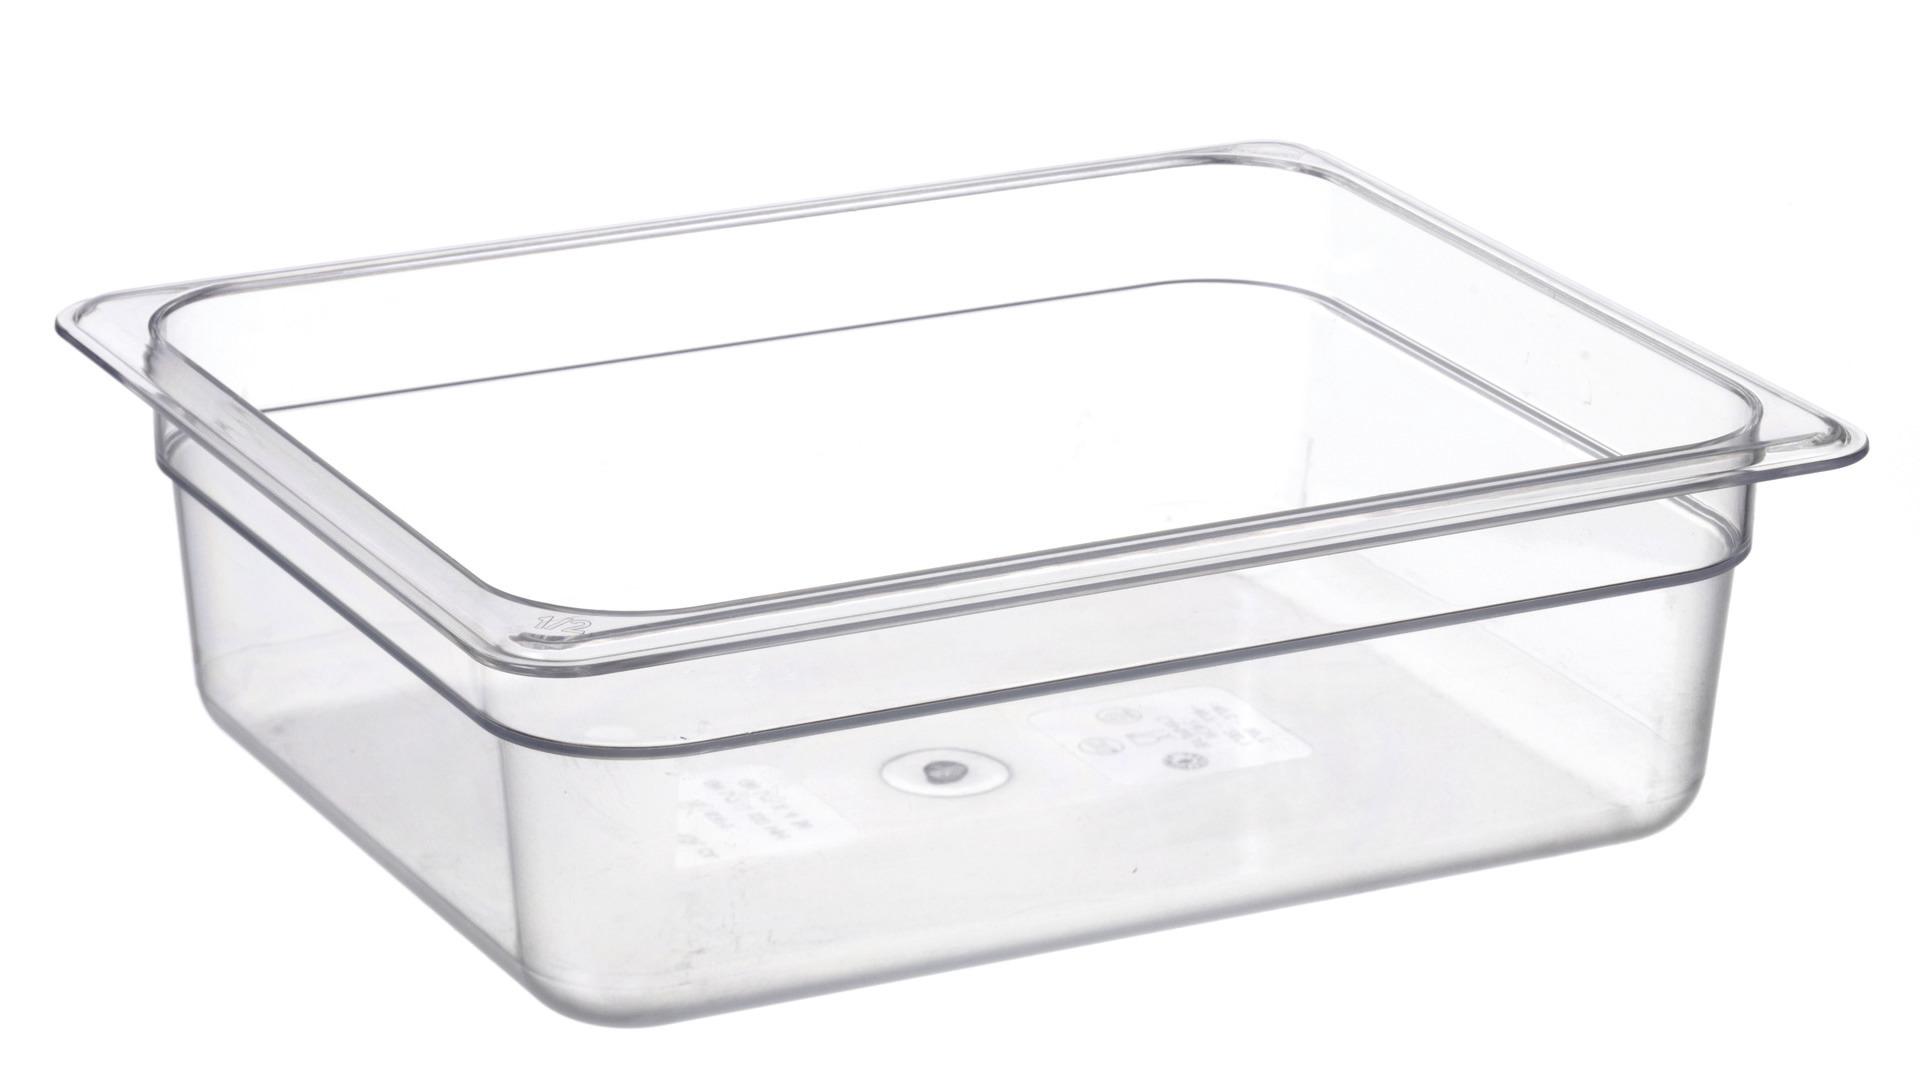 GN-Behälter GN 1/2 325 x 265 x 100 mm Polycarbonat transparent